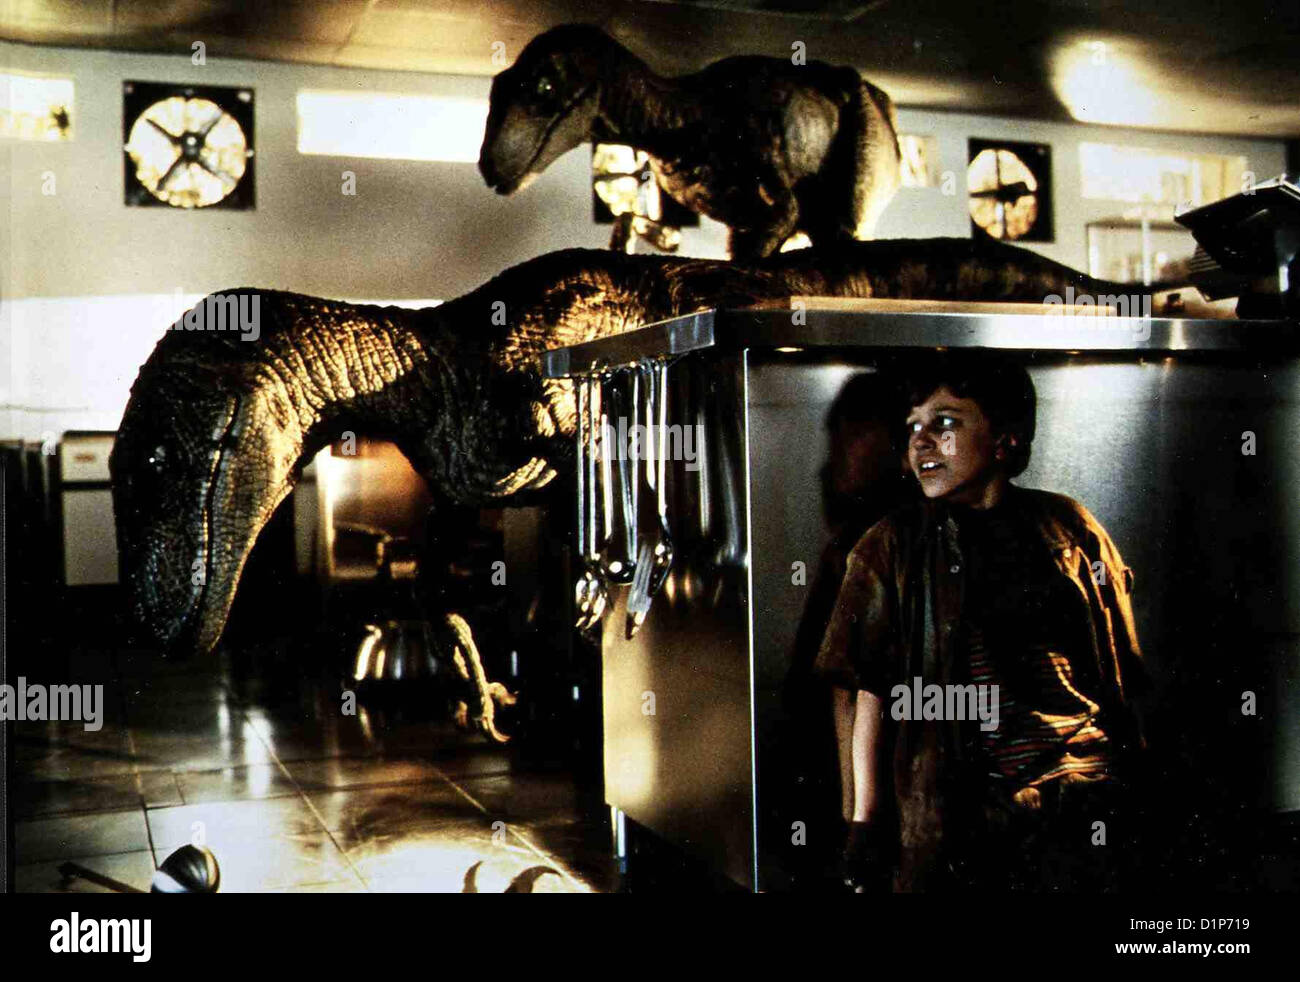 Jurassic Park   Jurassic Park - Hr   Joseph Mazzello *** Local Caption *** 1993  Universal Pic., clips 06/97 - Stock Image